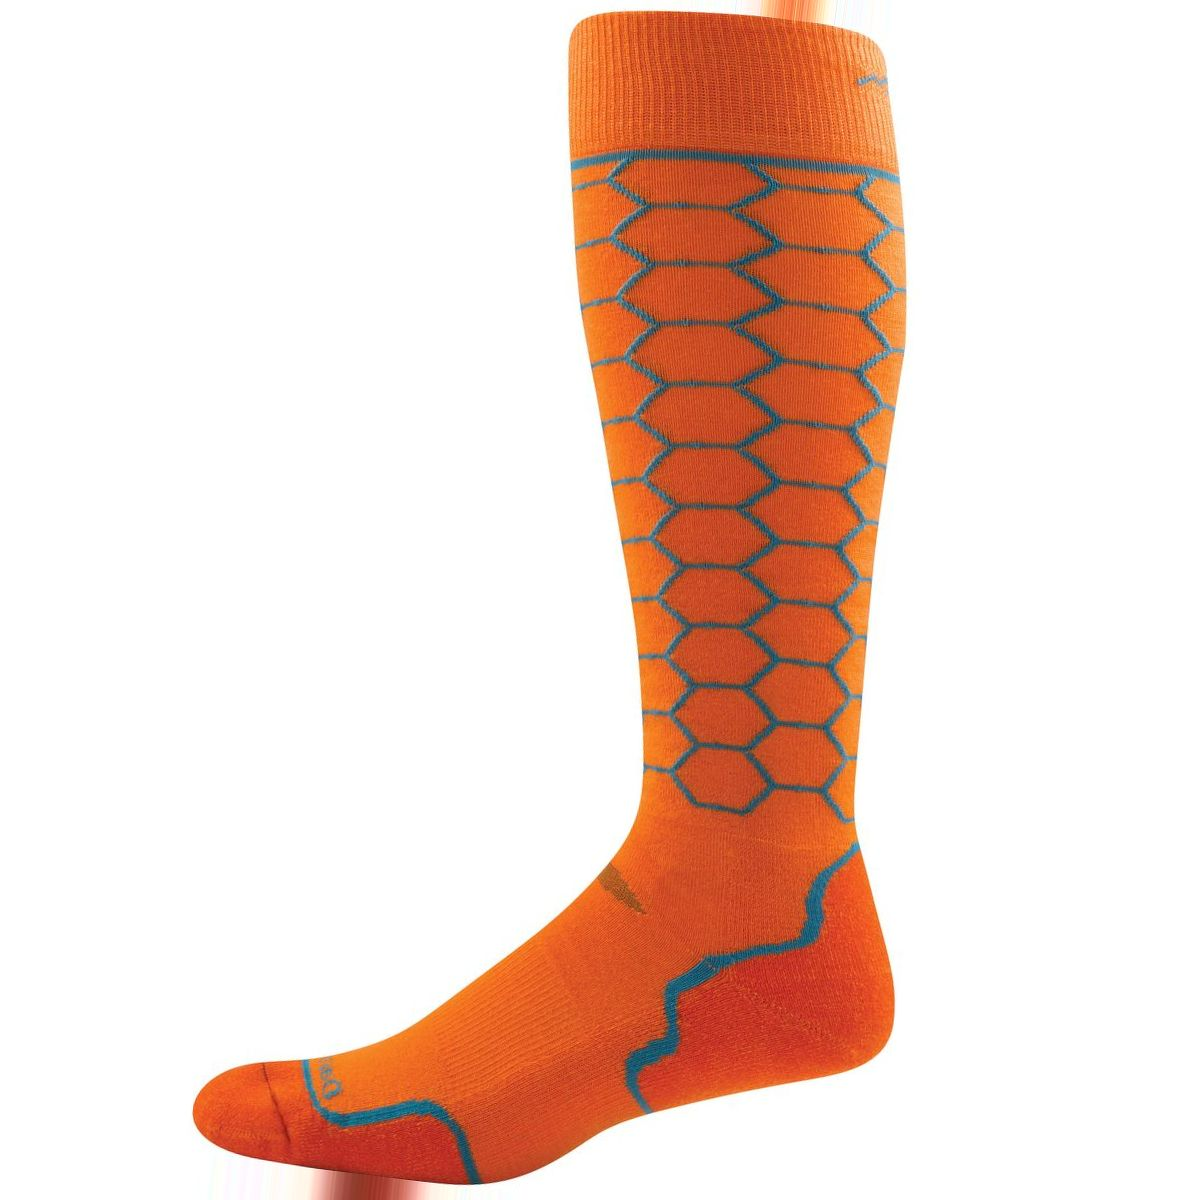 Darn Tough Honeycomb OTC Light Sock - Men's